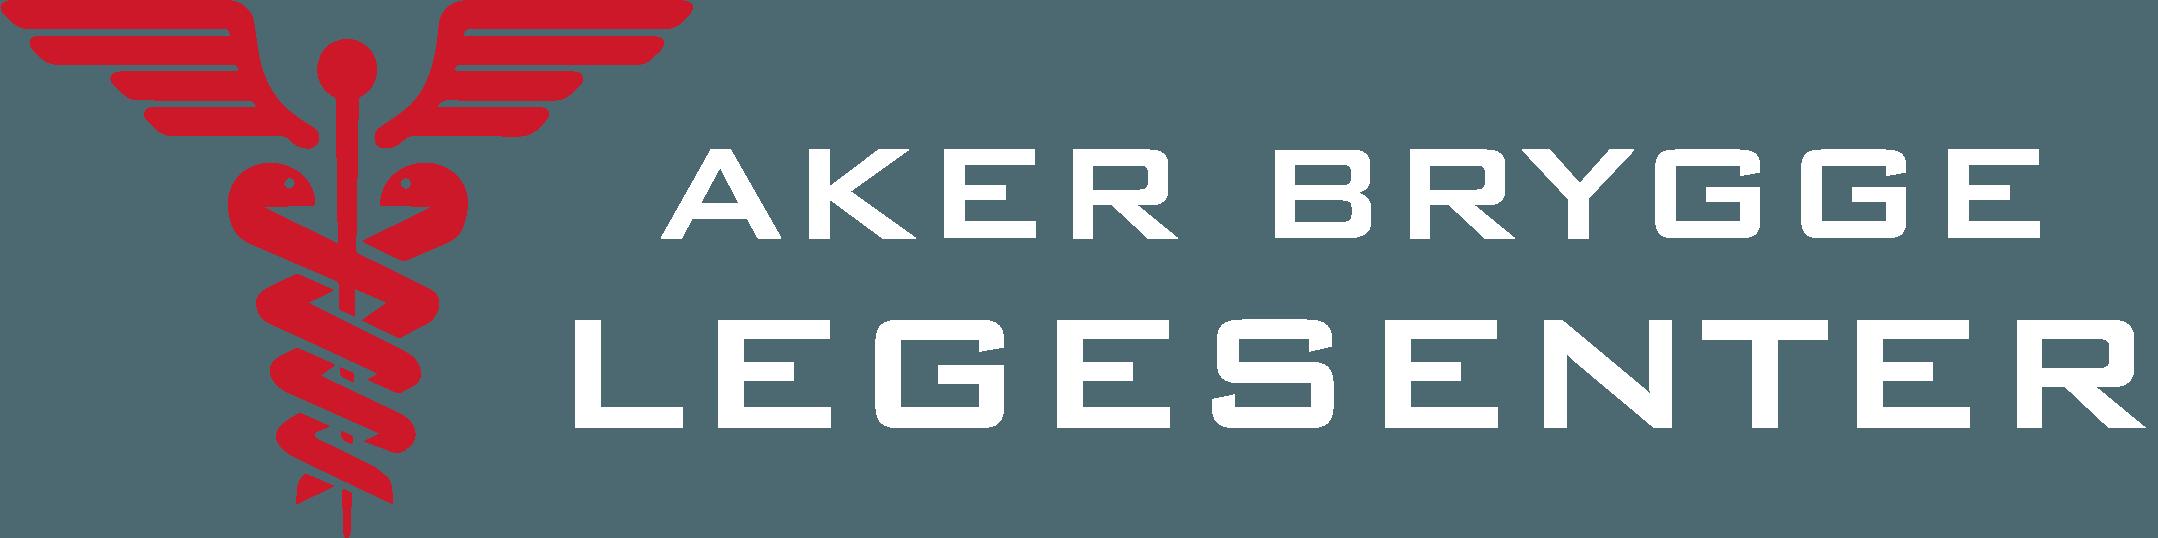 Aker Brygge Legesenter